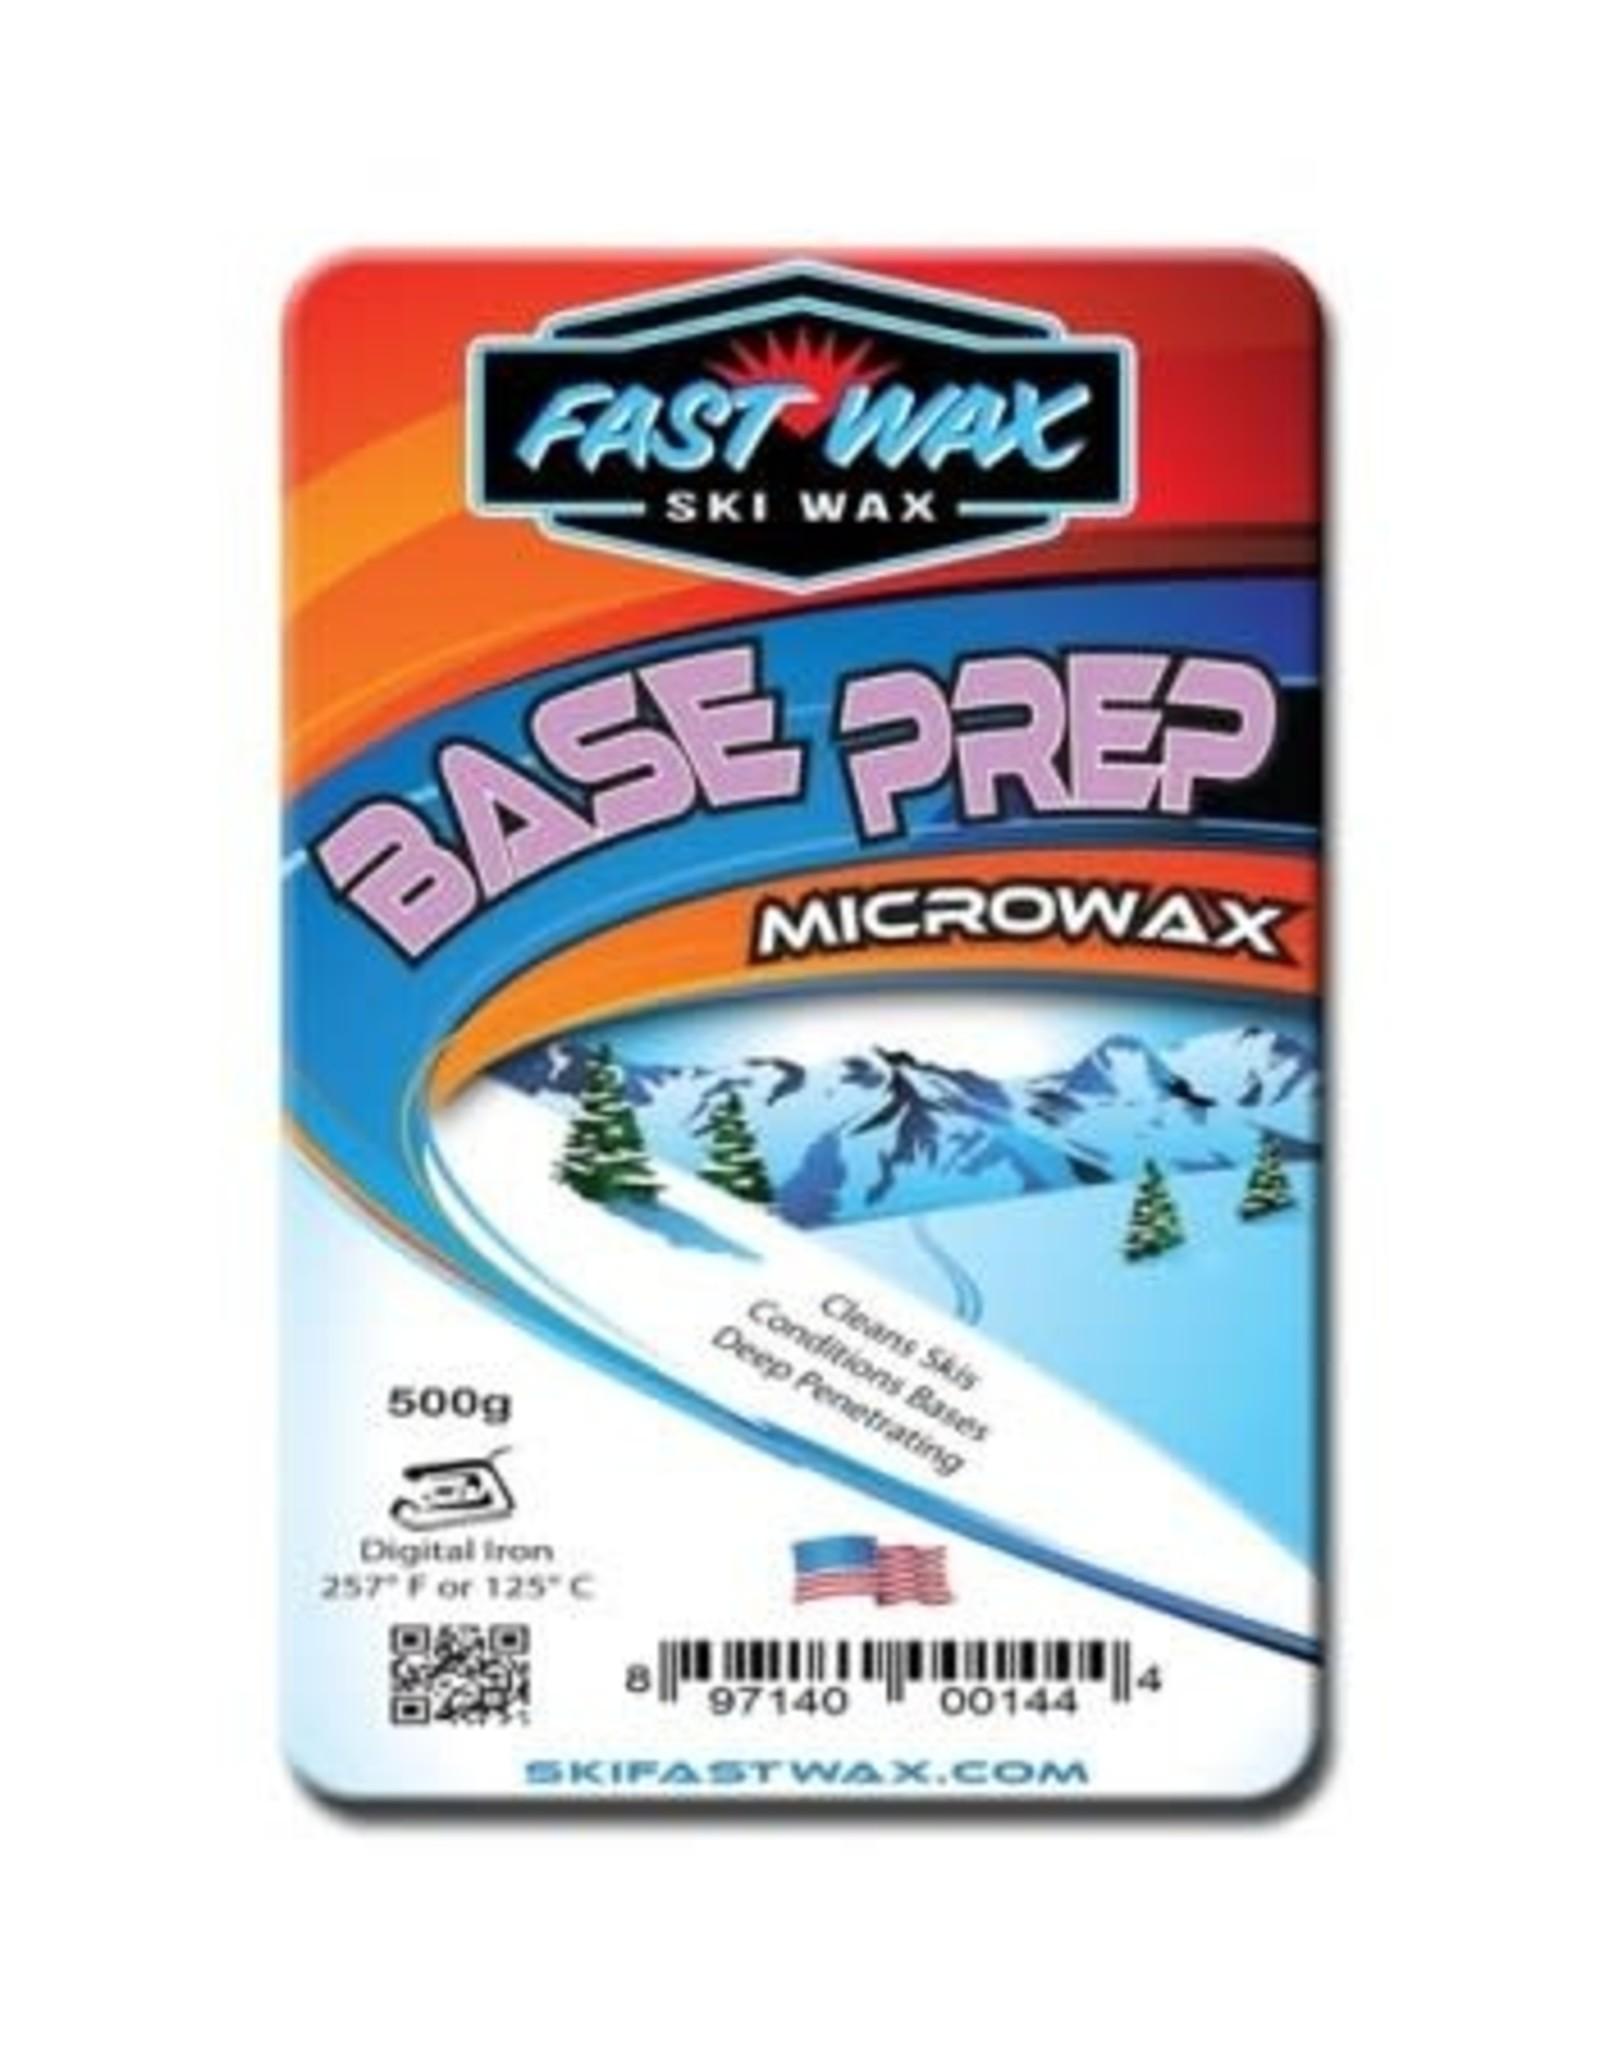 Fast Wax Fast Wax Shop Base Prep